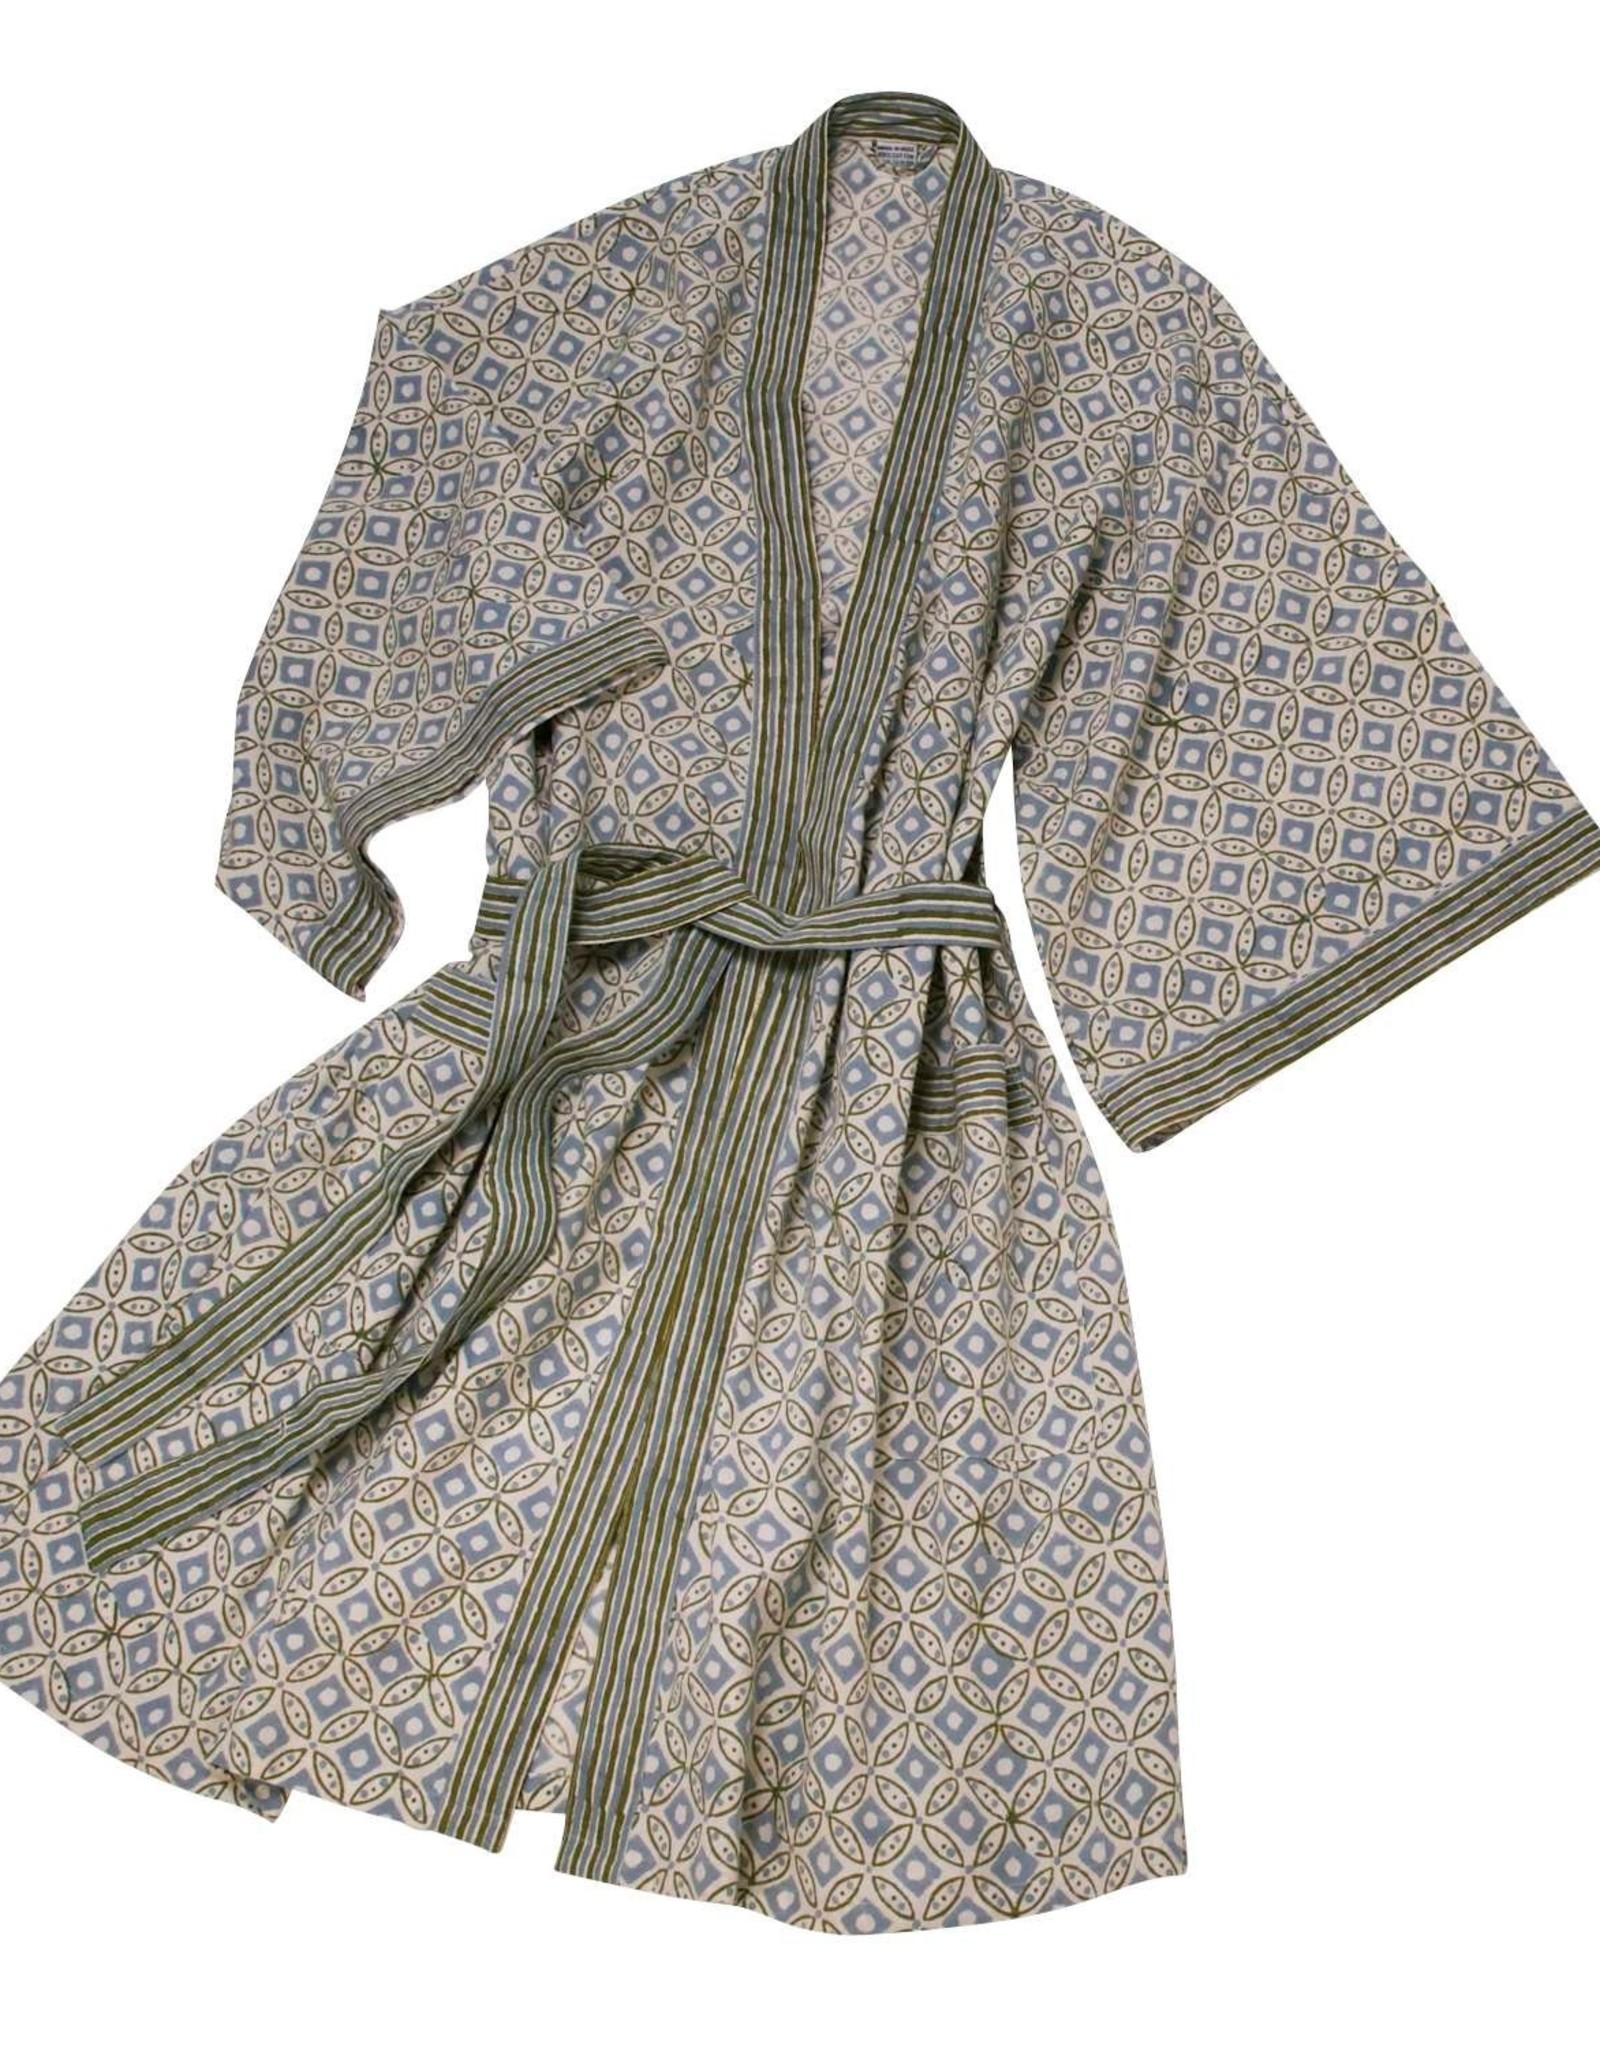 TTV USA Rajasthan Block Print Robe